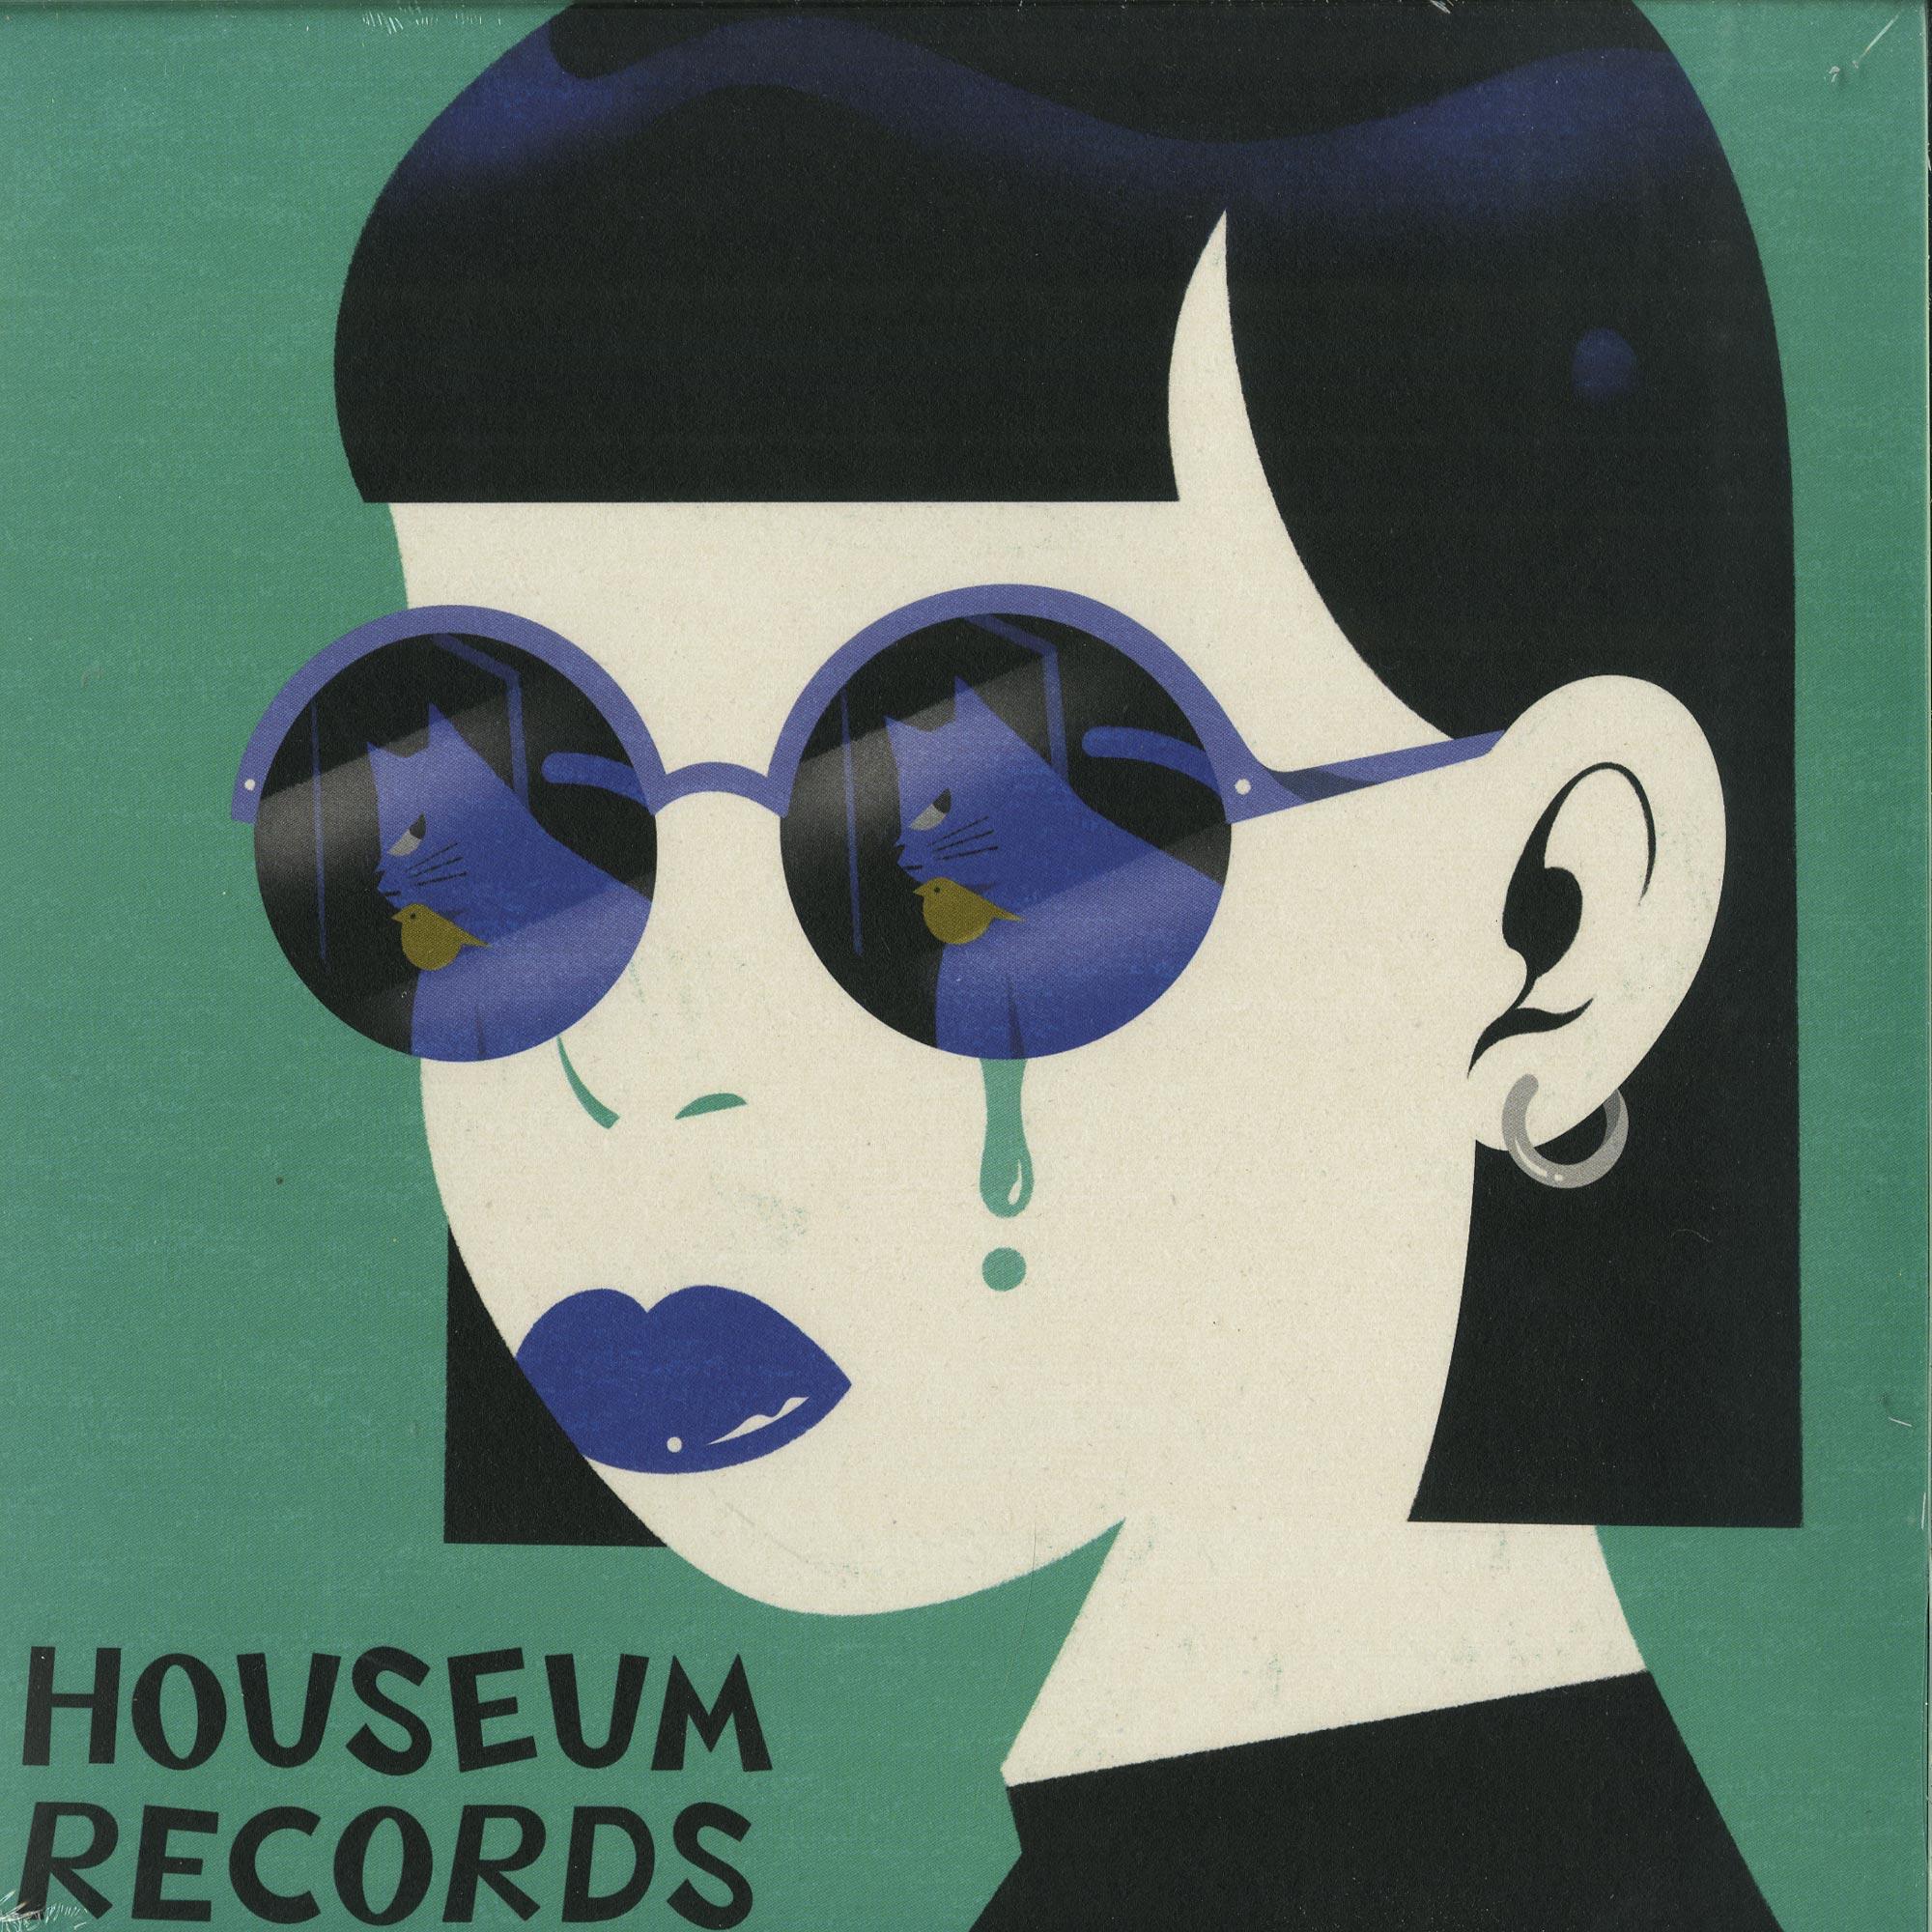 Marc Brauner - Sad But Ambitious EP